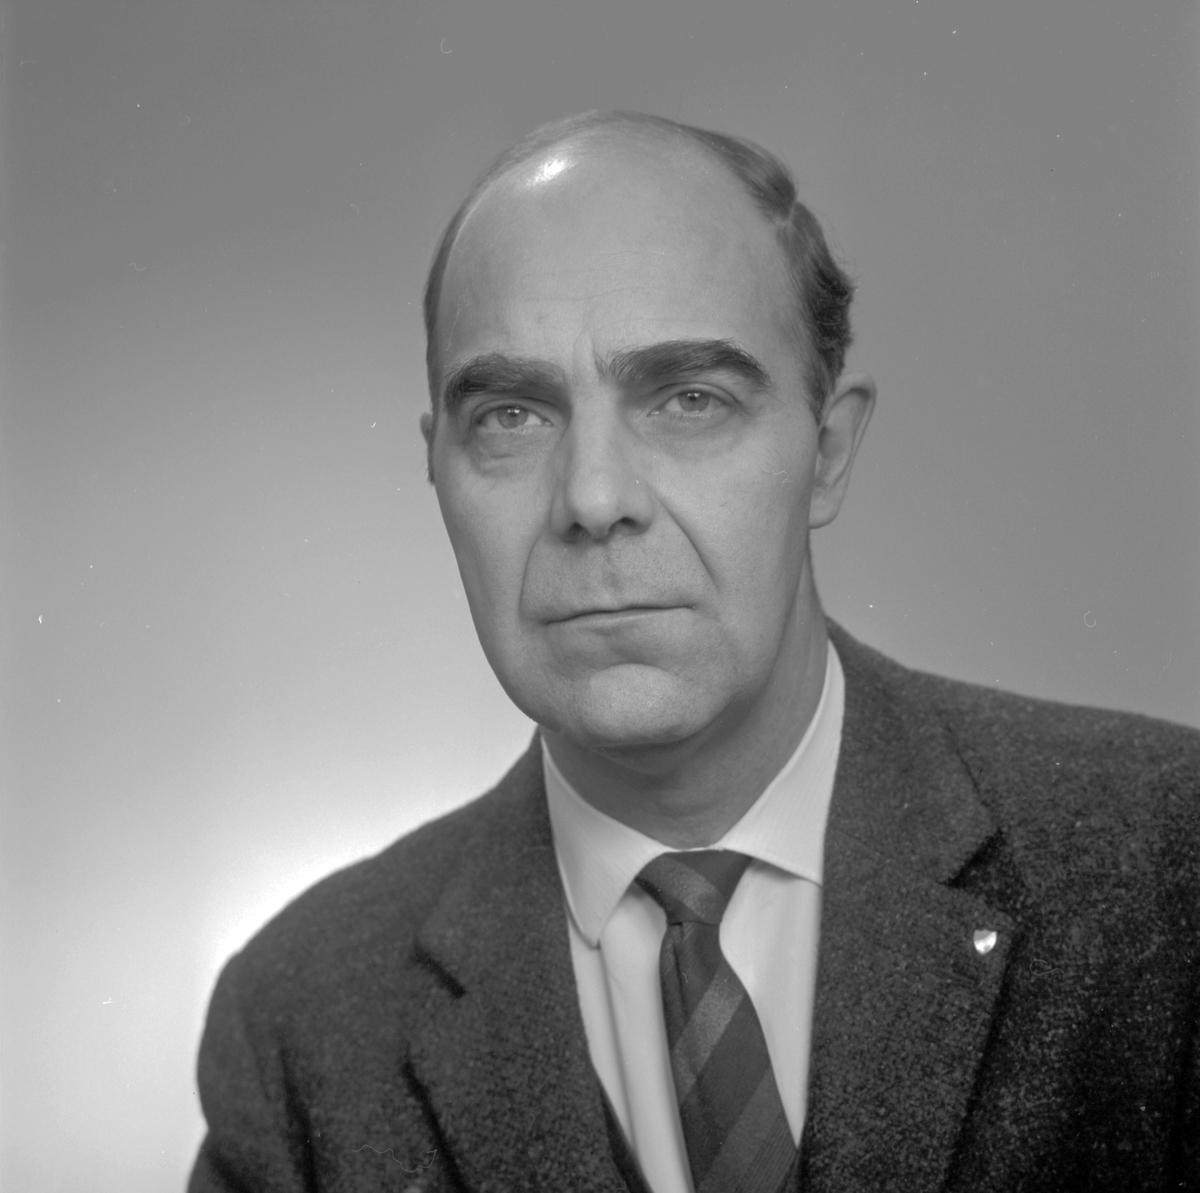 Postdirektionen. Olle L. Den 15 december 1966